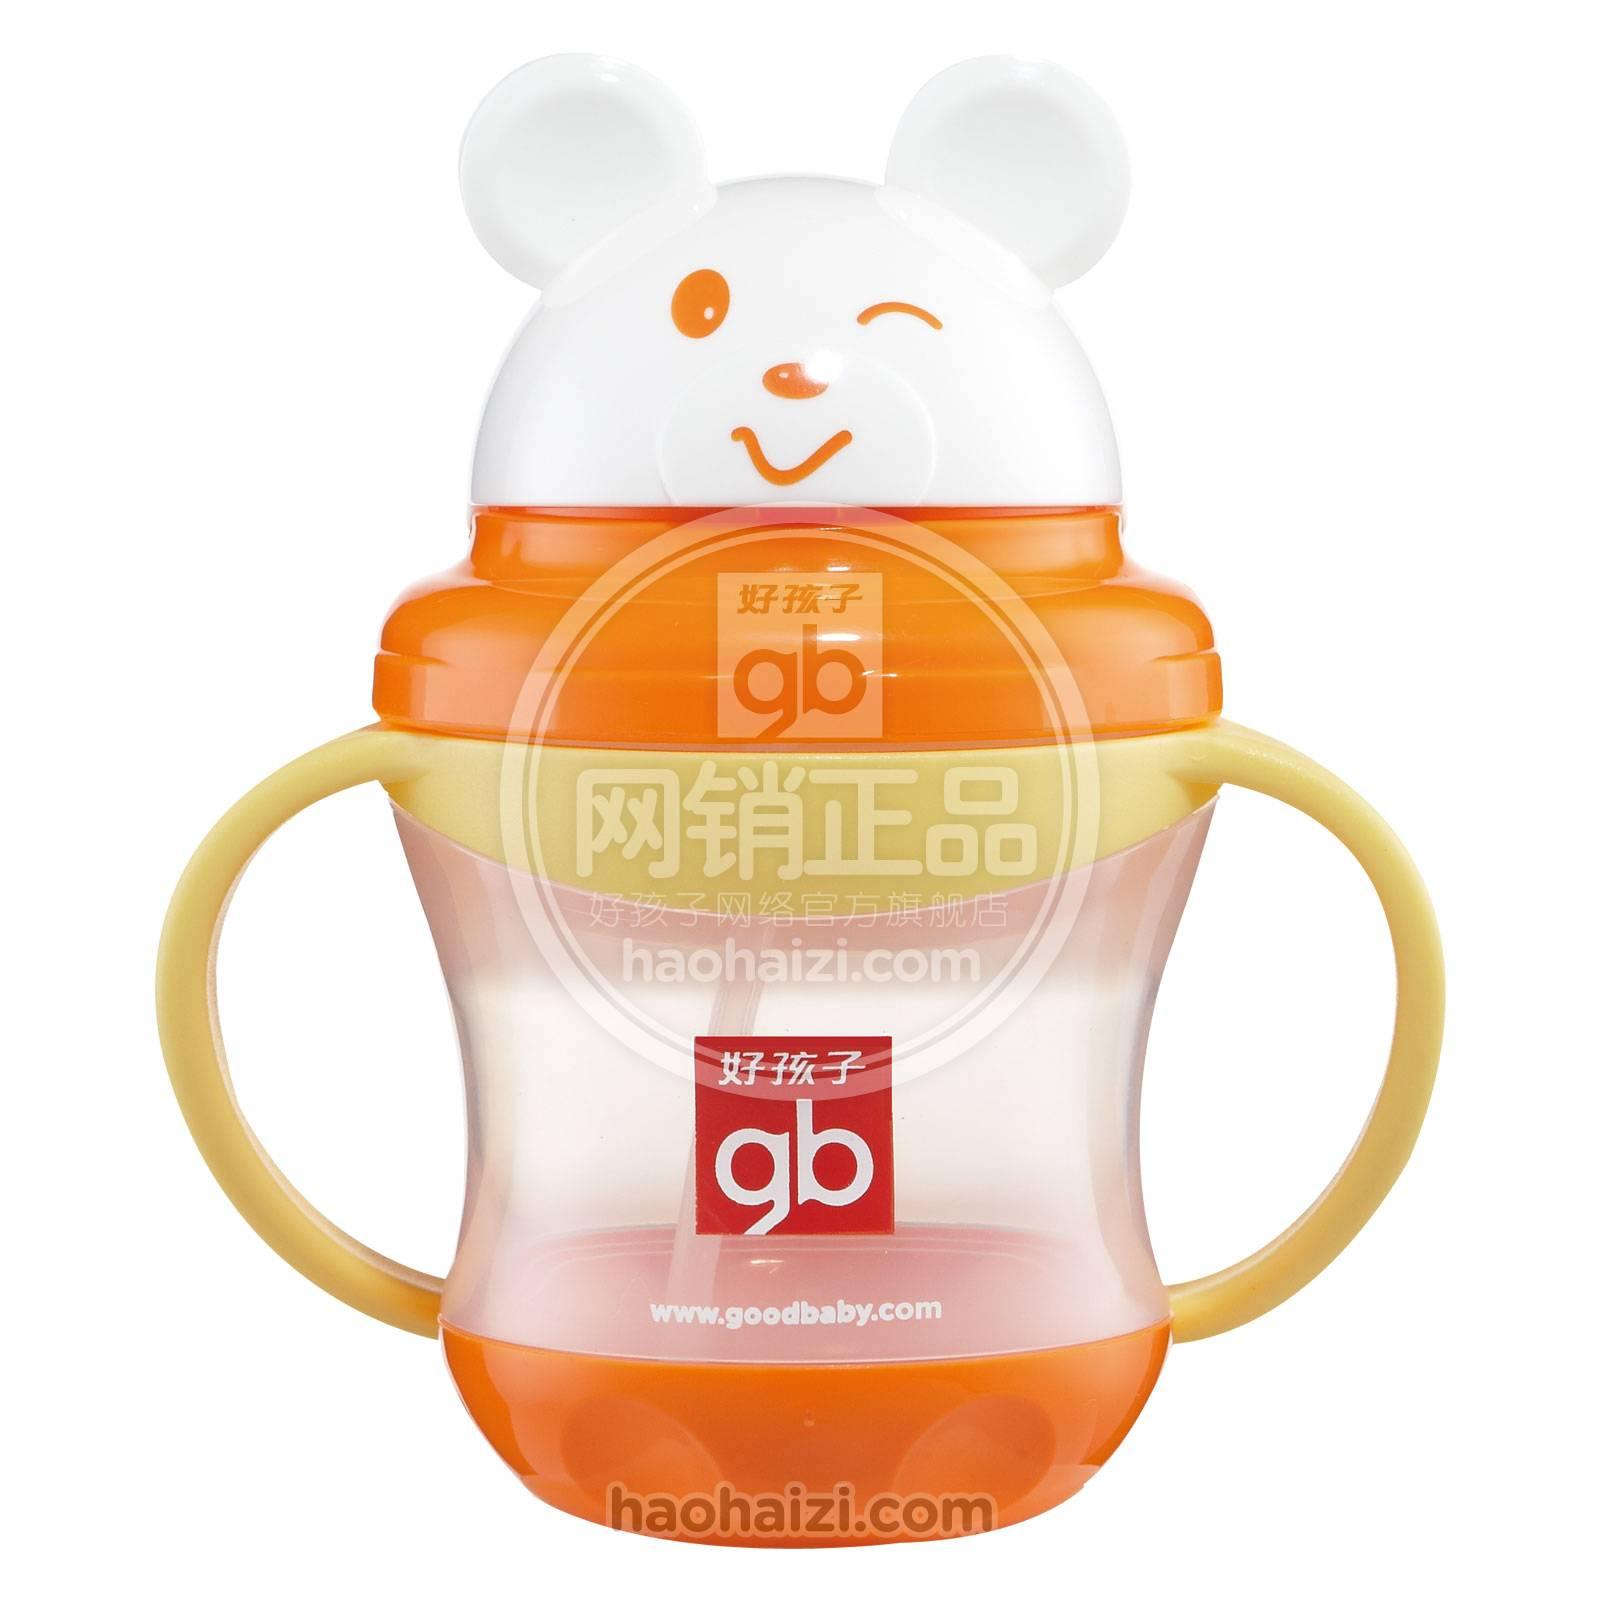 goodbaby 好孩子小熊可爱吸管杯宝宝训练杯水杯 h80009; 好孩子小熊